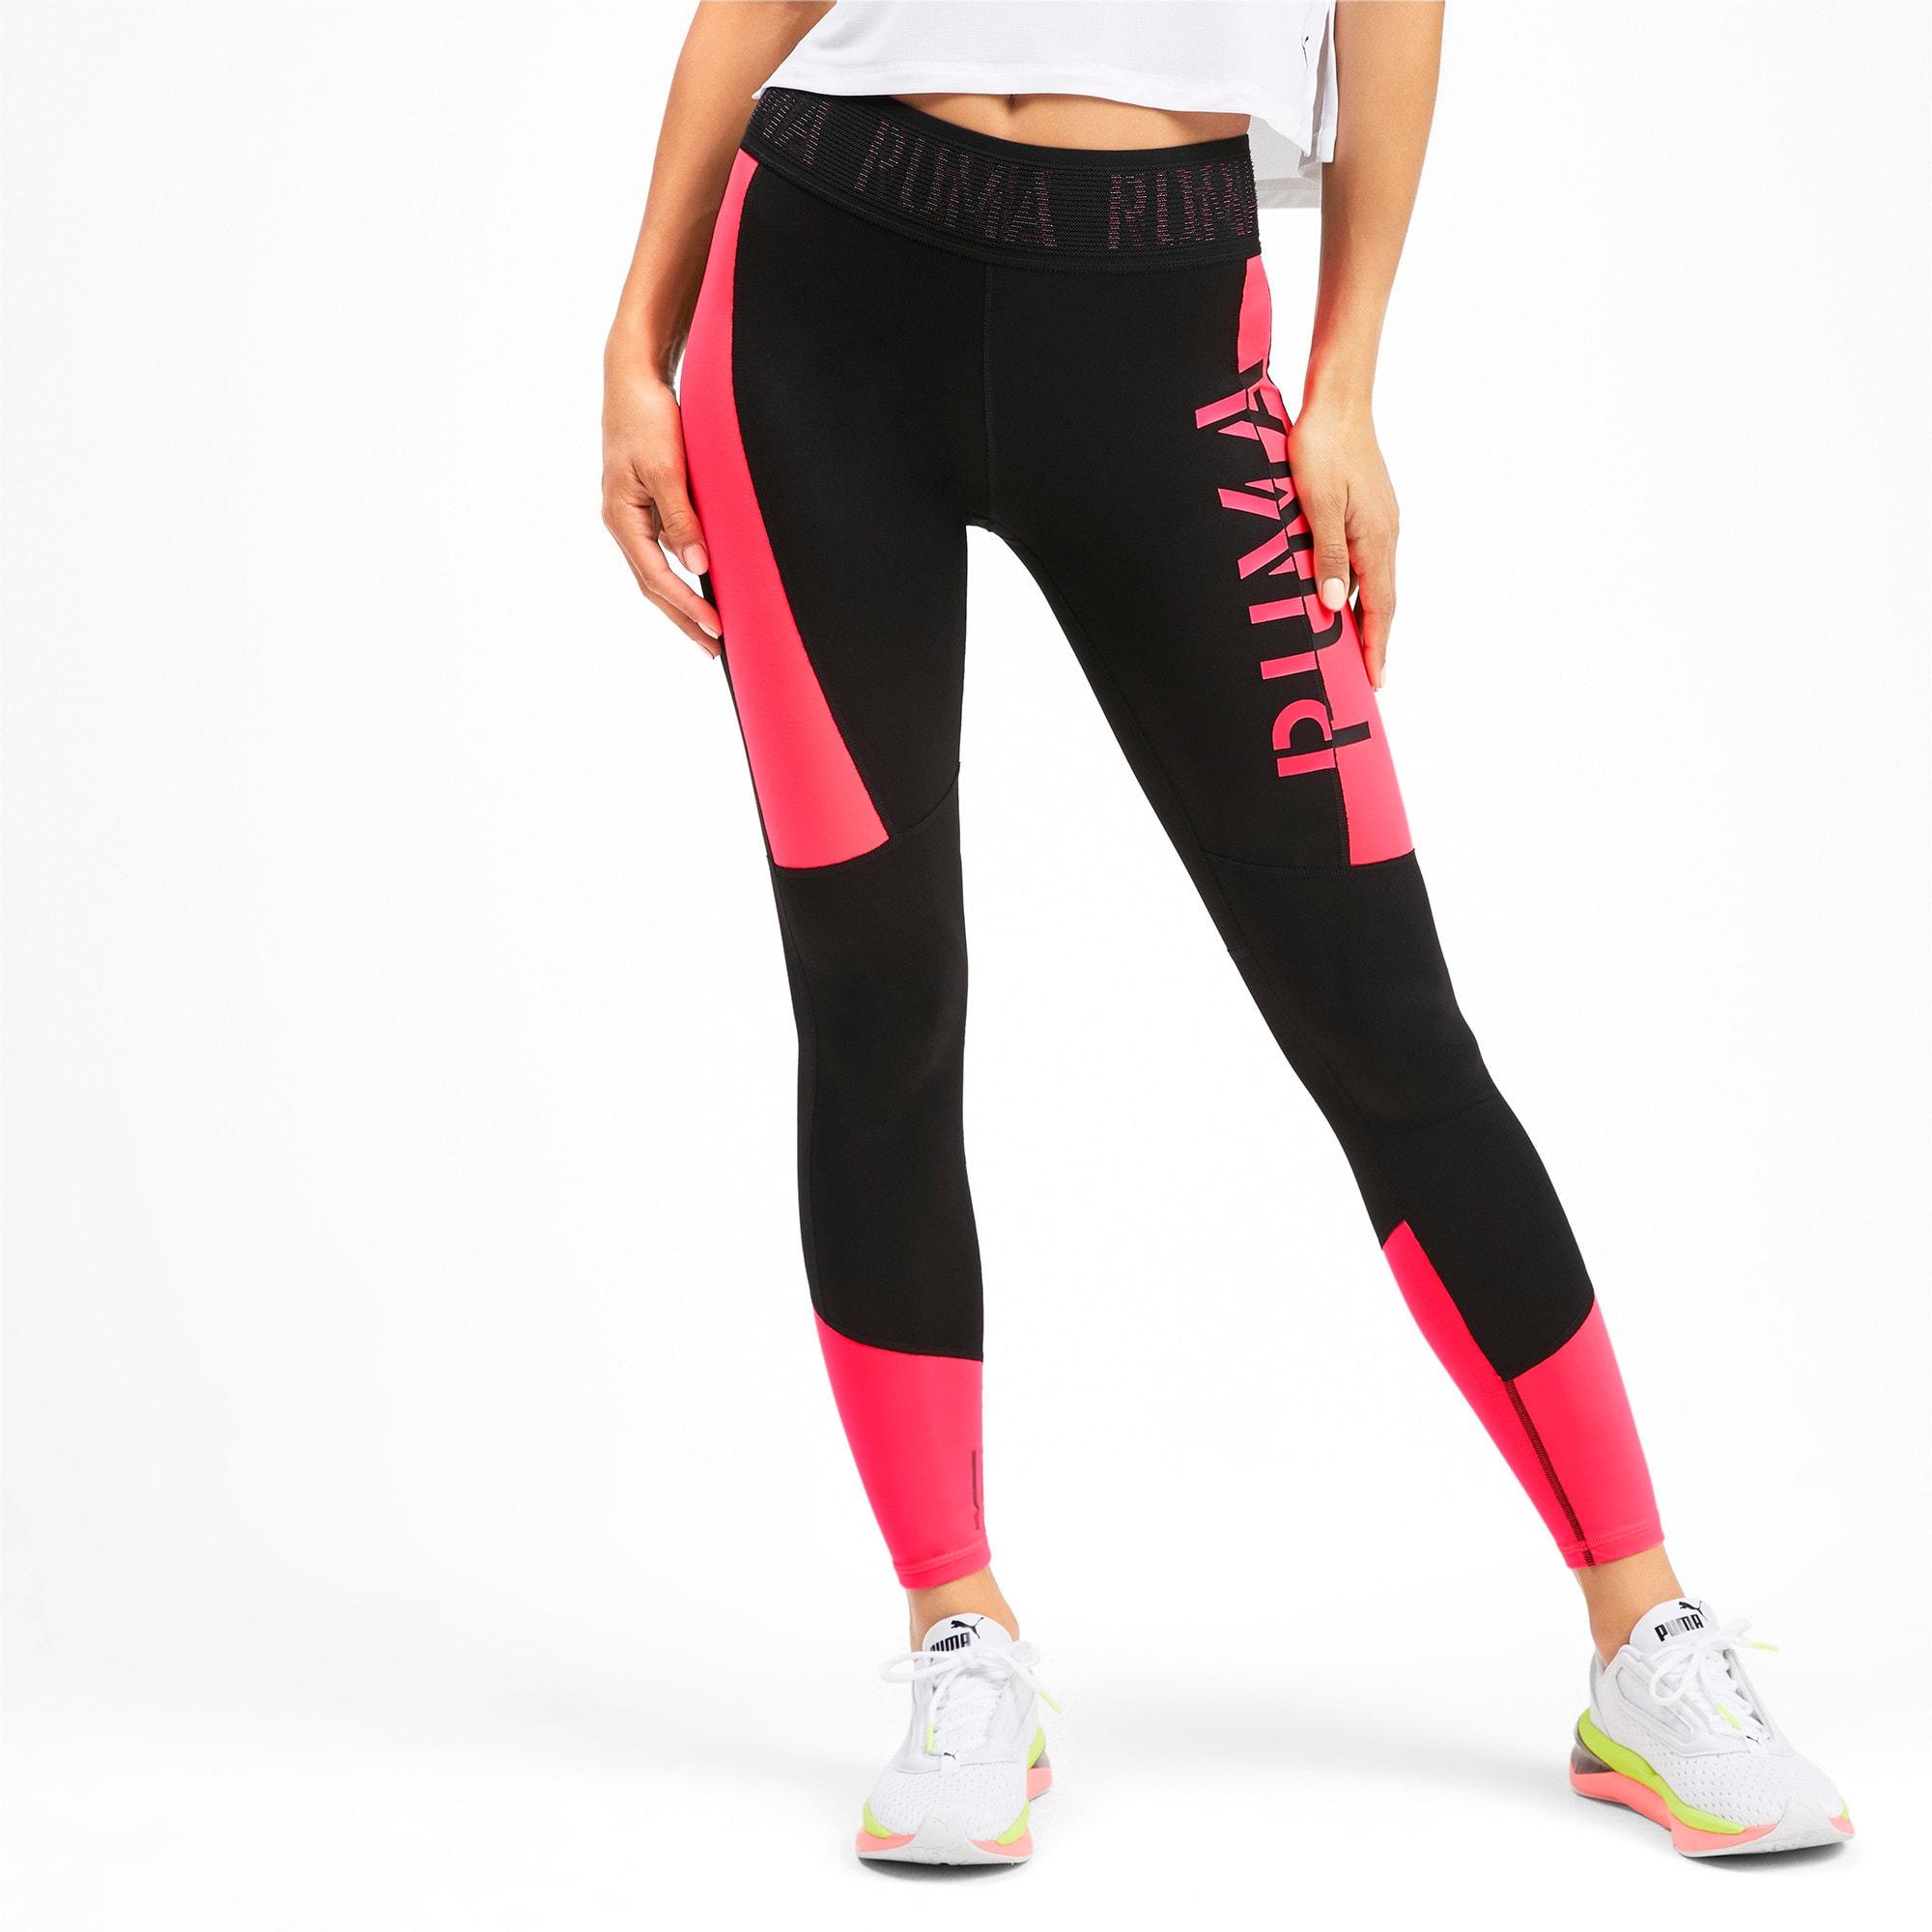 Thumbnail 1 of ADHM 2019 Logo 7/8 Women's Training Leggings, Puma Black-Pink Alert, medium-IND